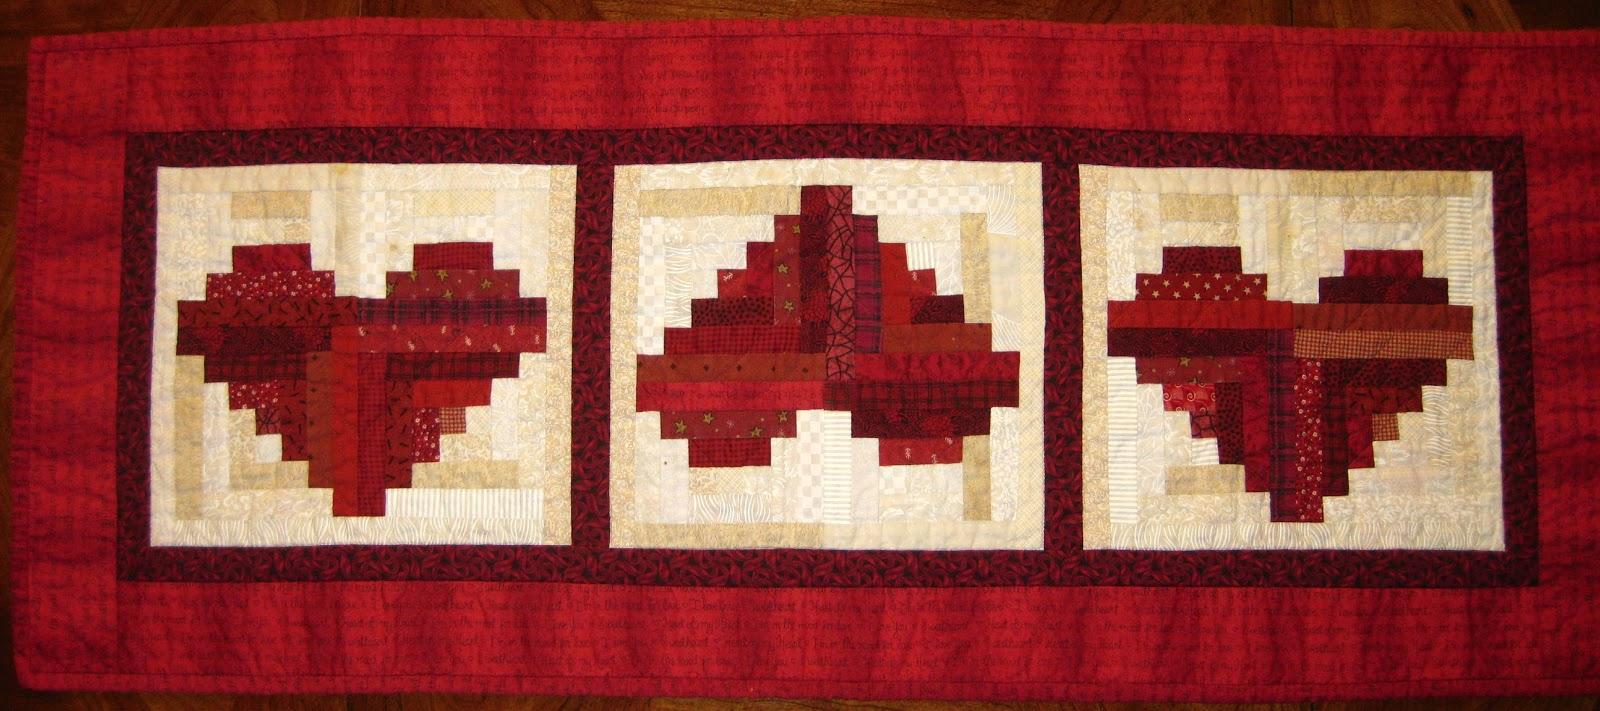 Log Cabin Heart Quilt Block Pattern : Favorite Quilting Tips and Recipes!: Log Cabin Heart Quilt Pattern